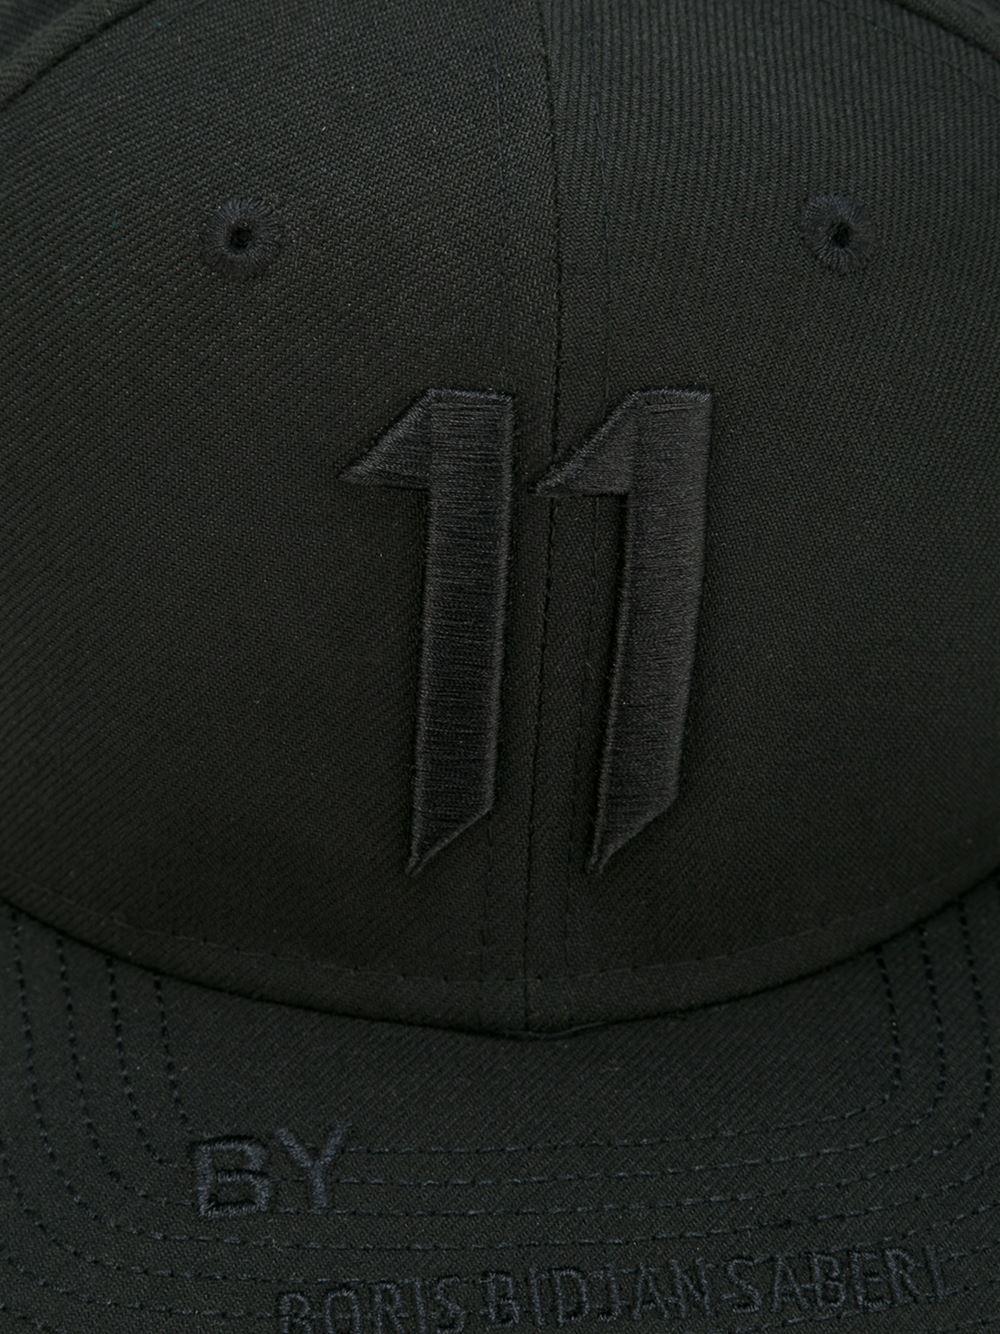 Lyst - Boris Bidjan Saberi 11 Embroidered 11 Cap in Black for Men f0c7527f15dd